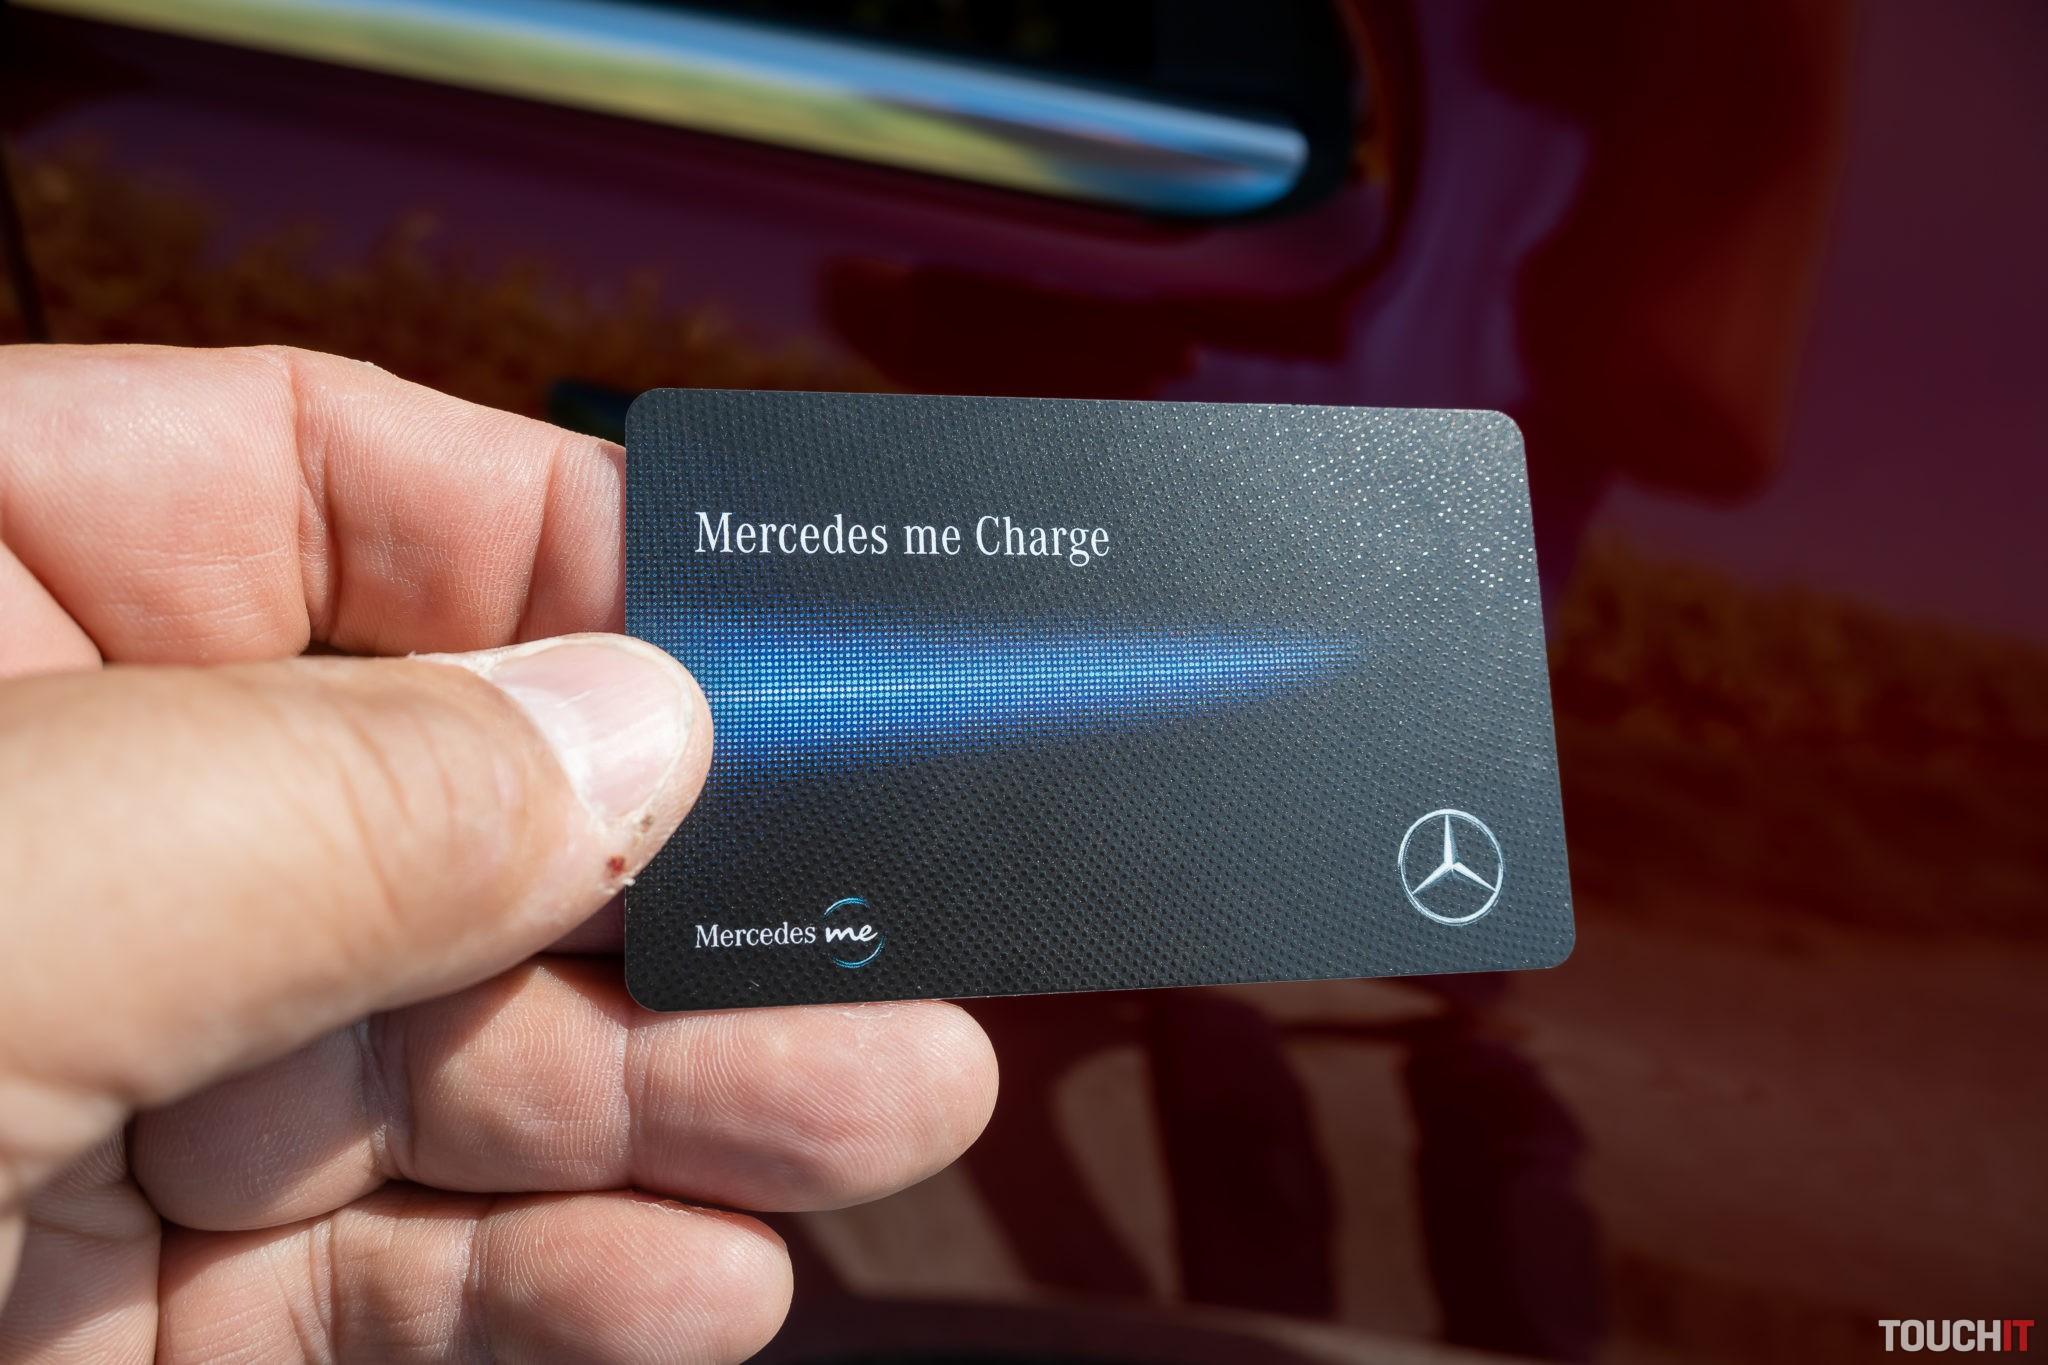 Kartu Mercedes me Charge stačí len priložiť k nabíjačke. Všetko ostatné je automatické